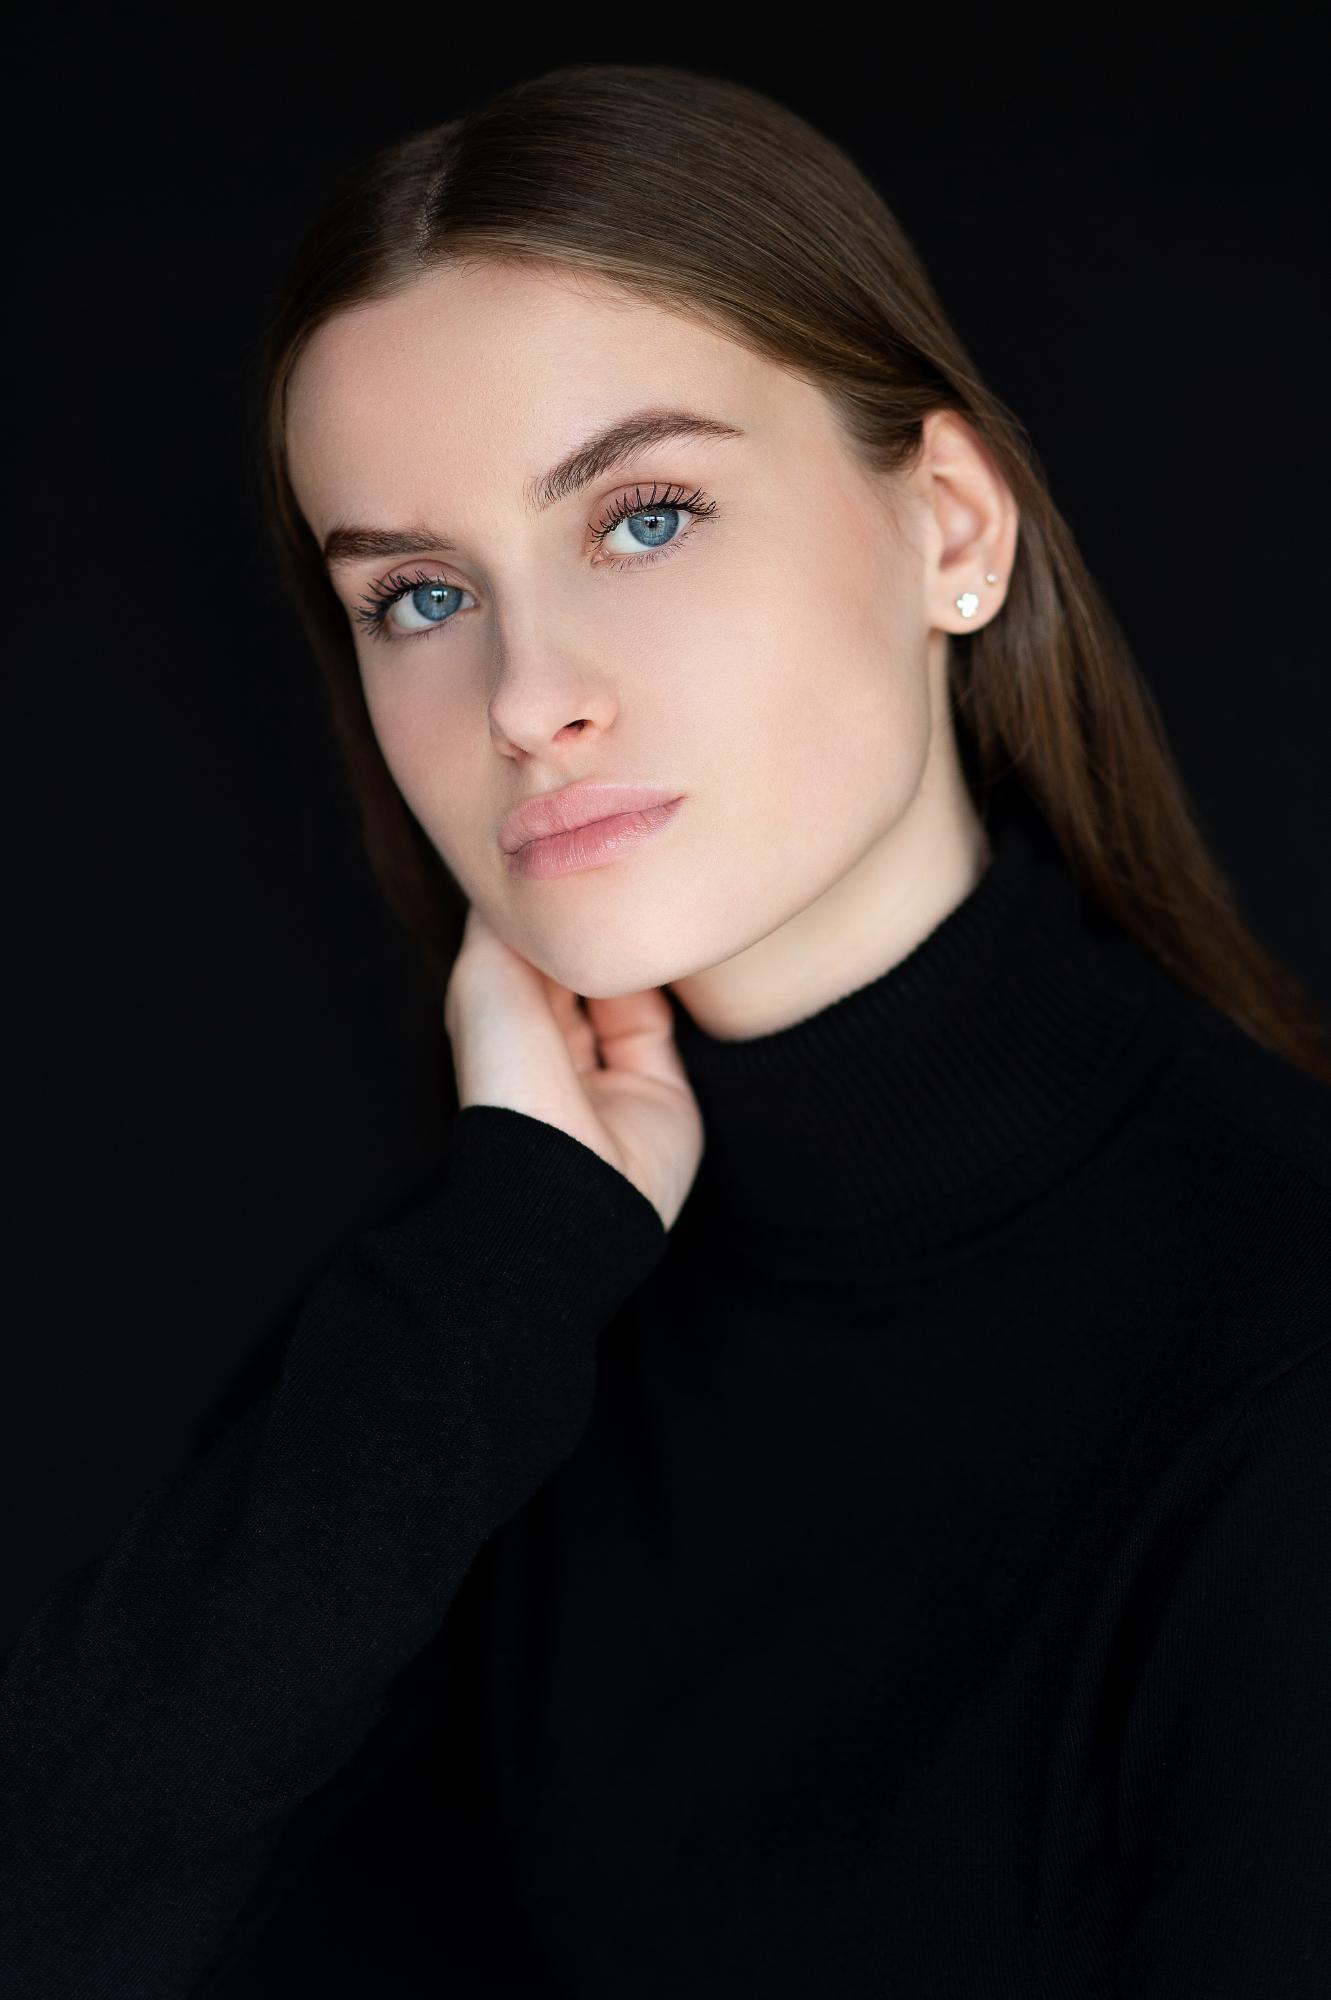 Portrait Meike a003 lr.jpg